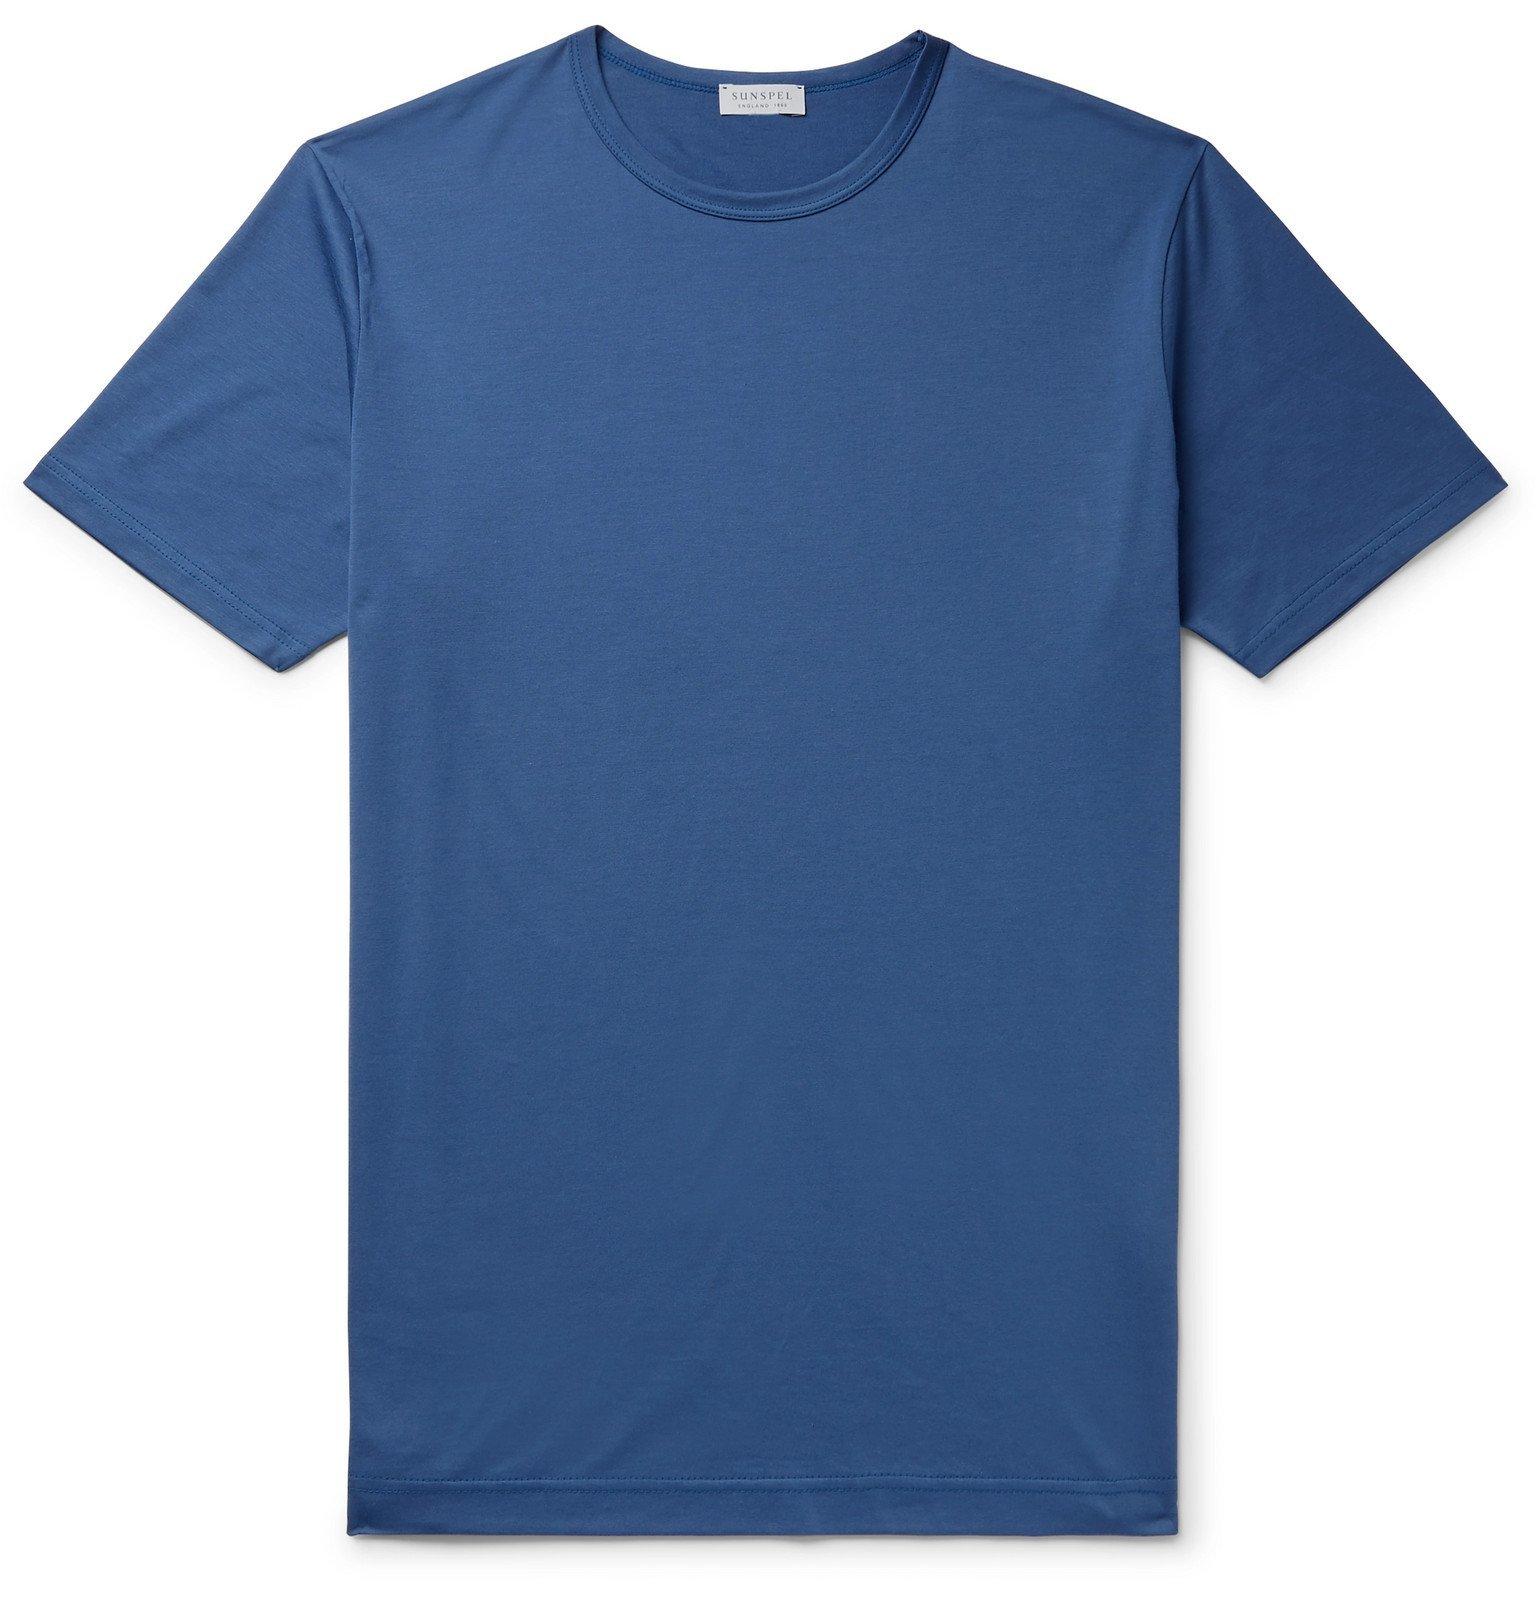 Sunspel - Slim-Fit Cotton-Jersey T-Shirt - Blue